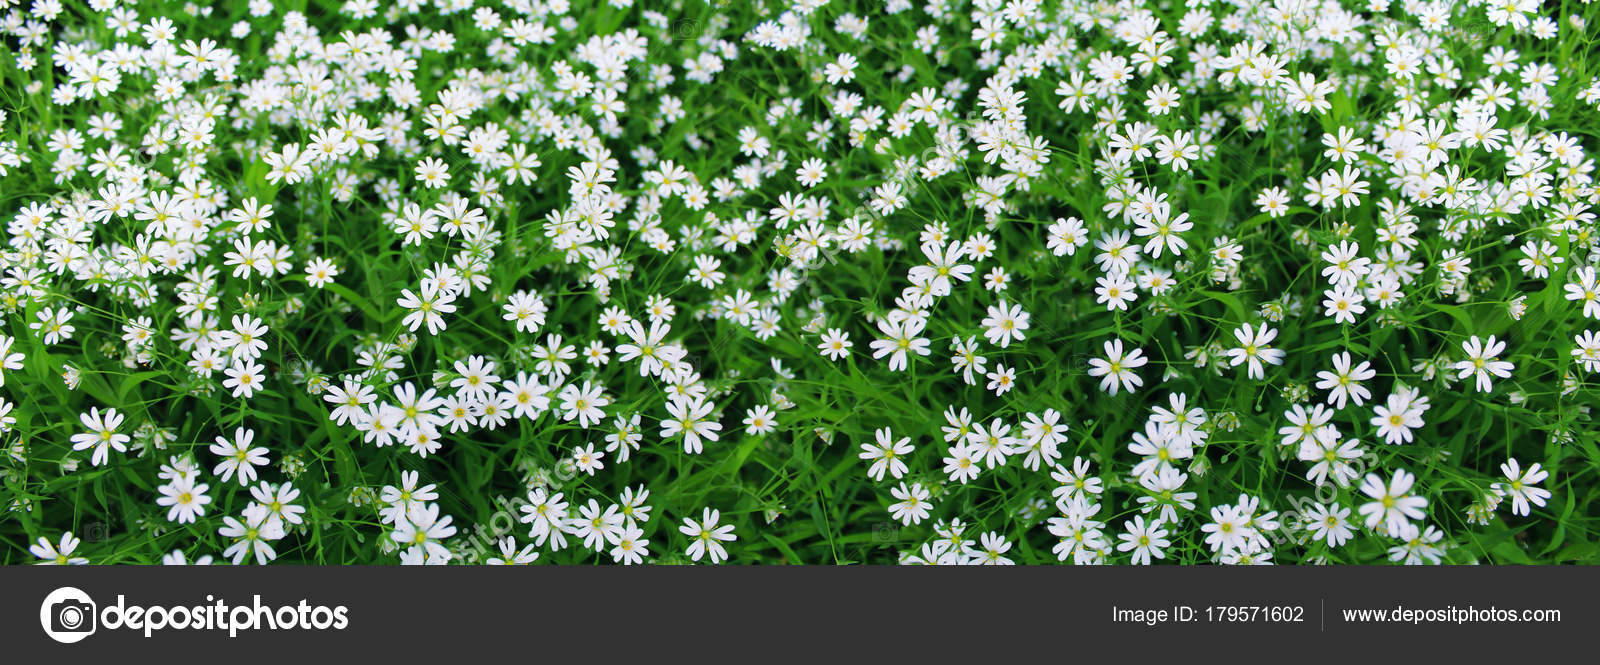 Flores Blancas Silvestres Imagen Panoramica Flores Silvestres